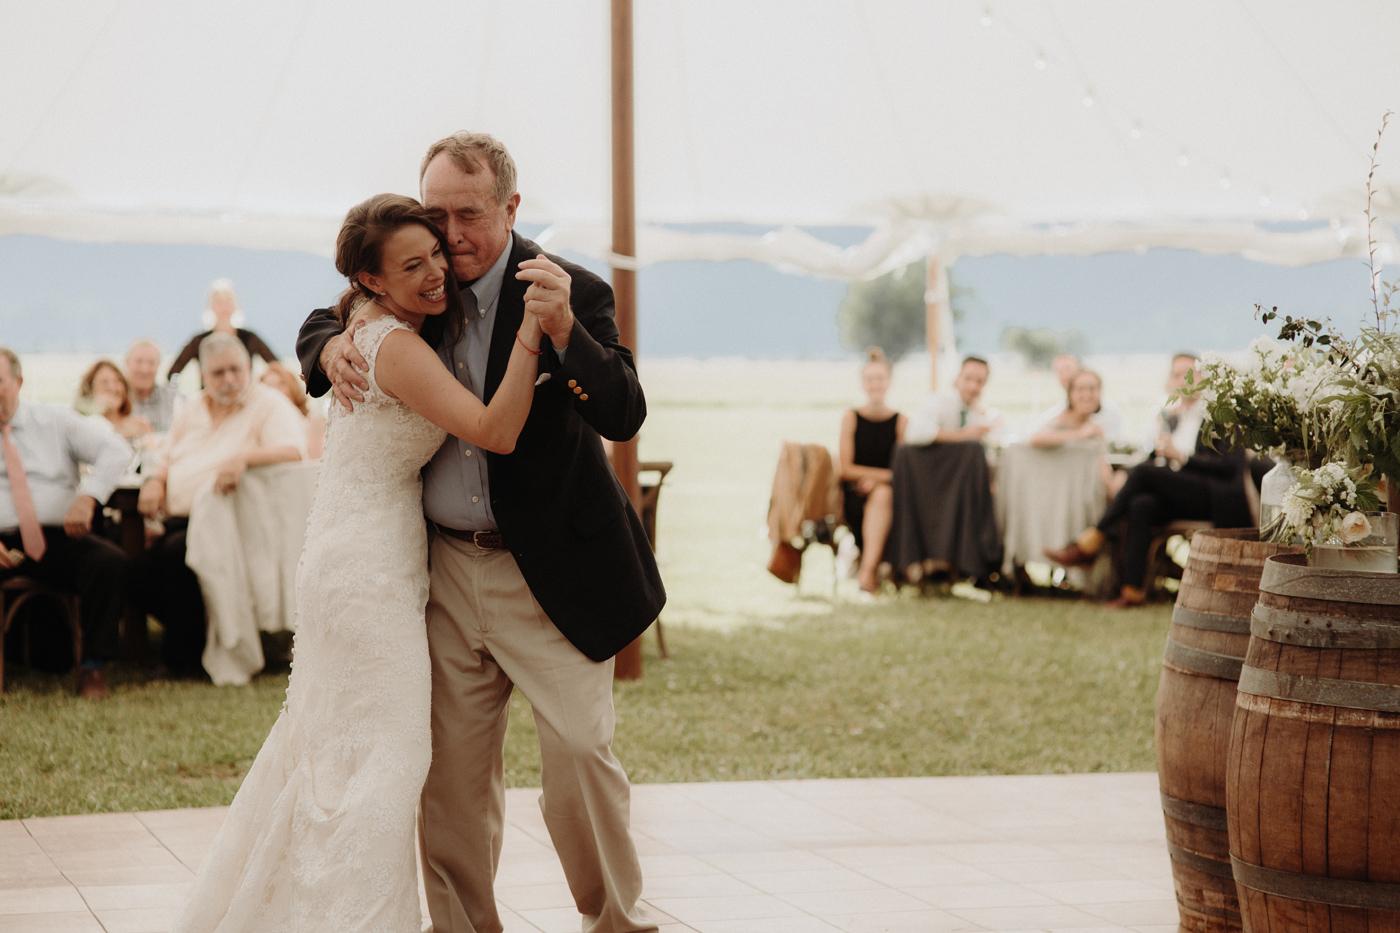 079-grand-teton-jackson-hole-wyoming-wedding.jpg